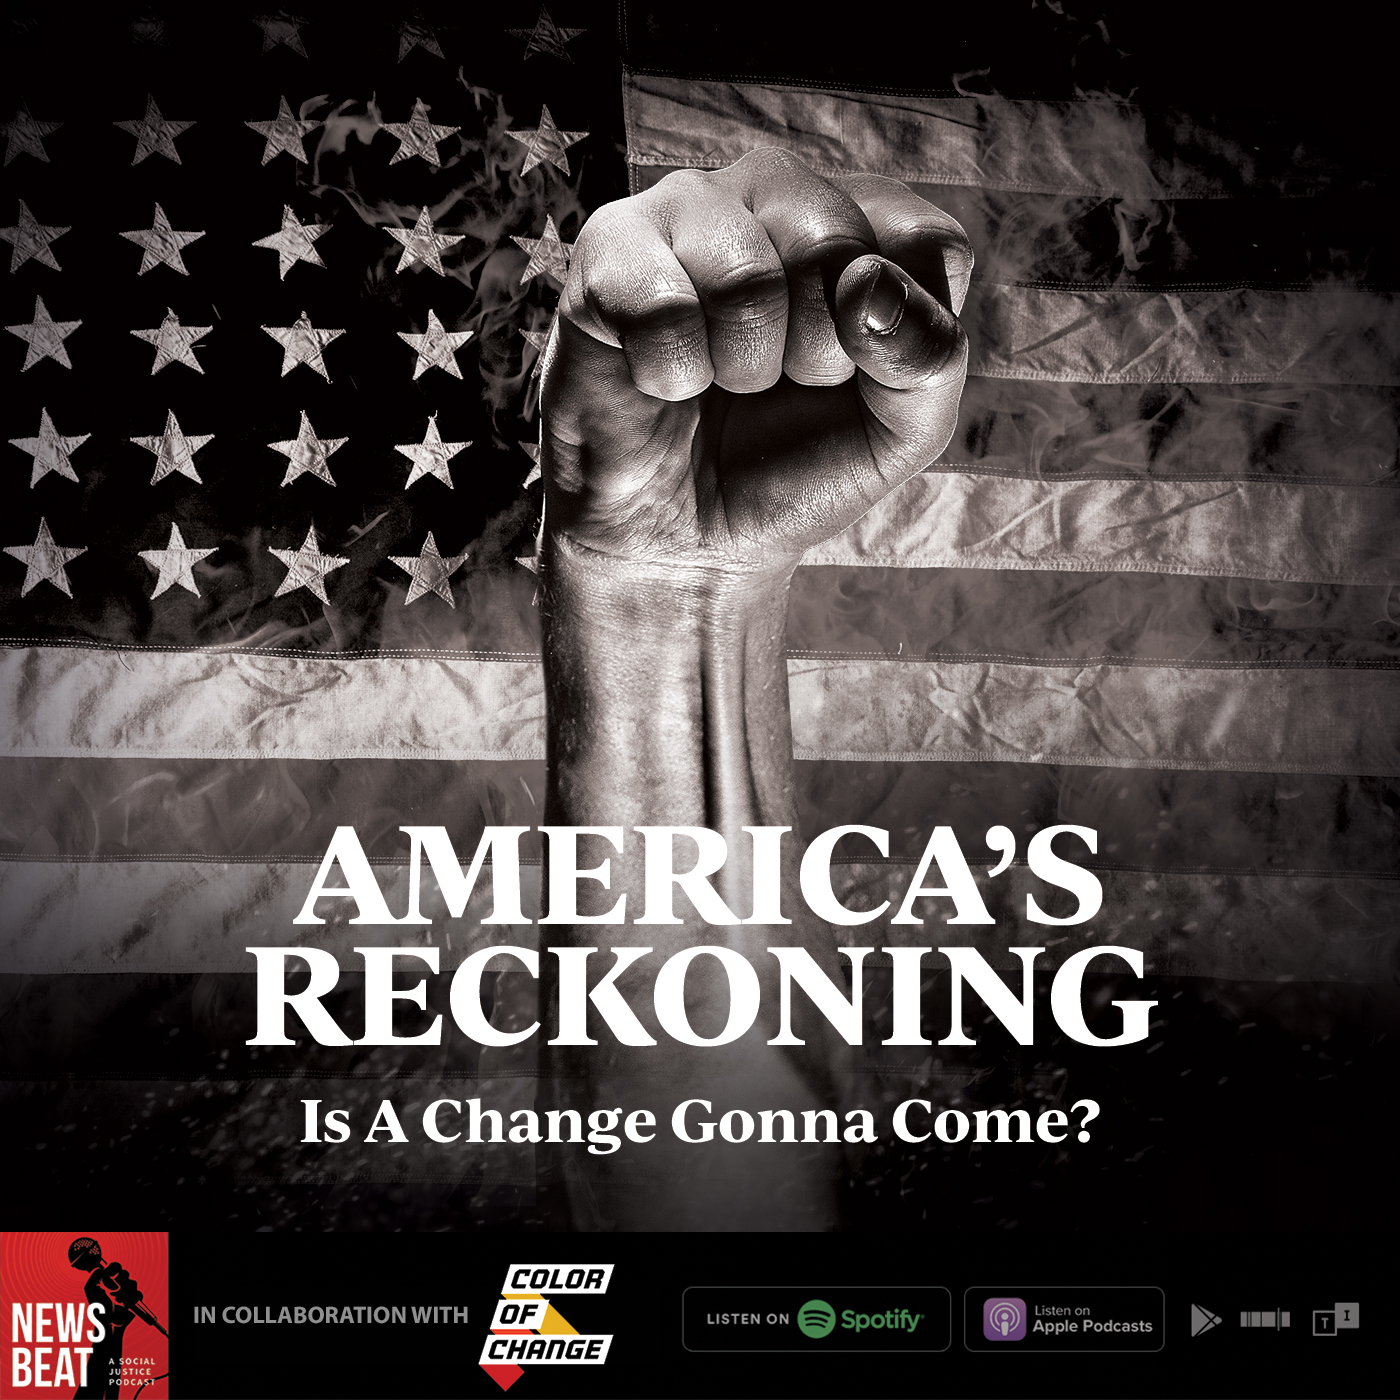 America's Reckoning